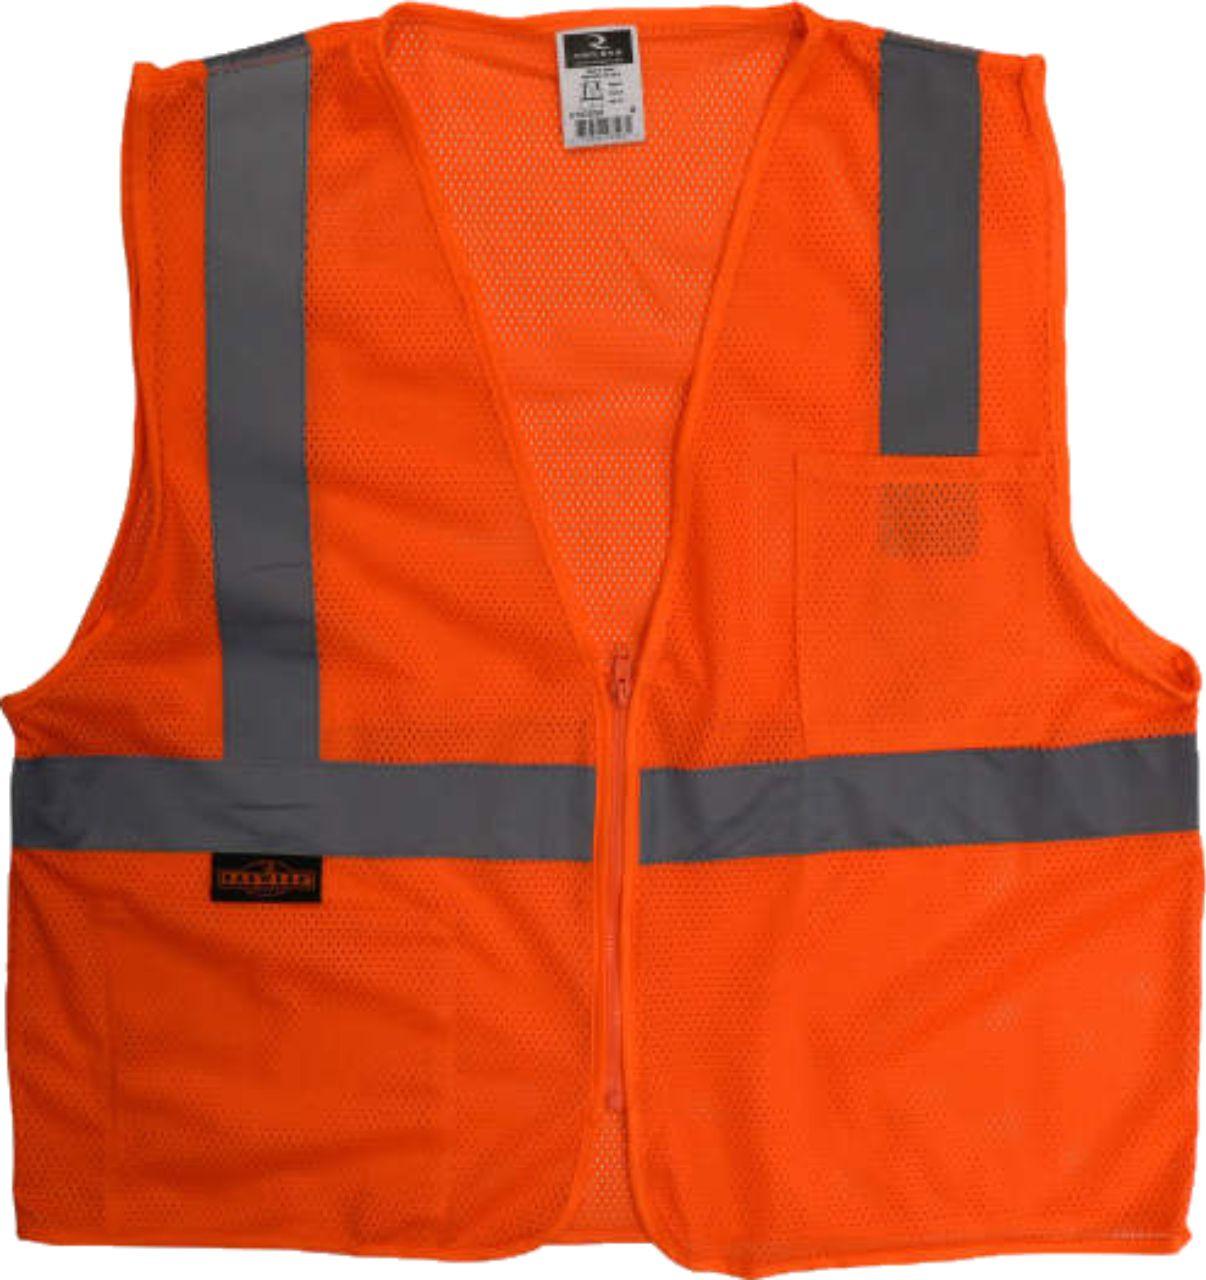 SV2 Safety Orange  Safety Vest   Safety Green Class 2 Safety Vest   Lime Safety Jacket   Hi Vis Safety Vest